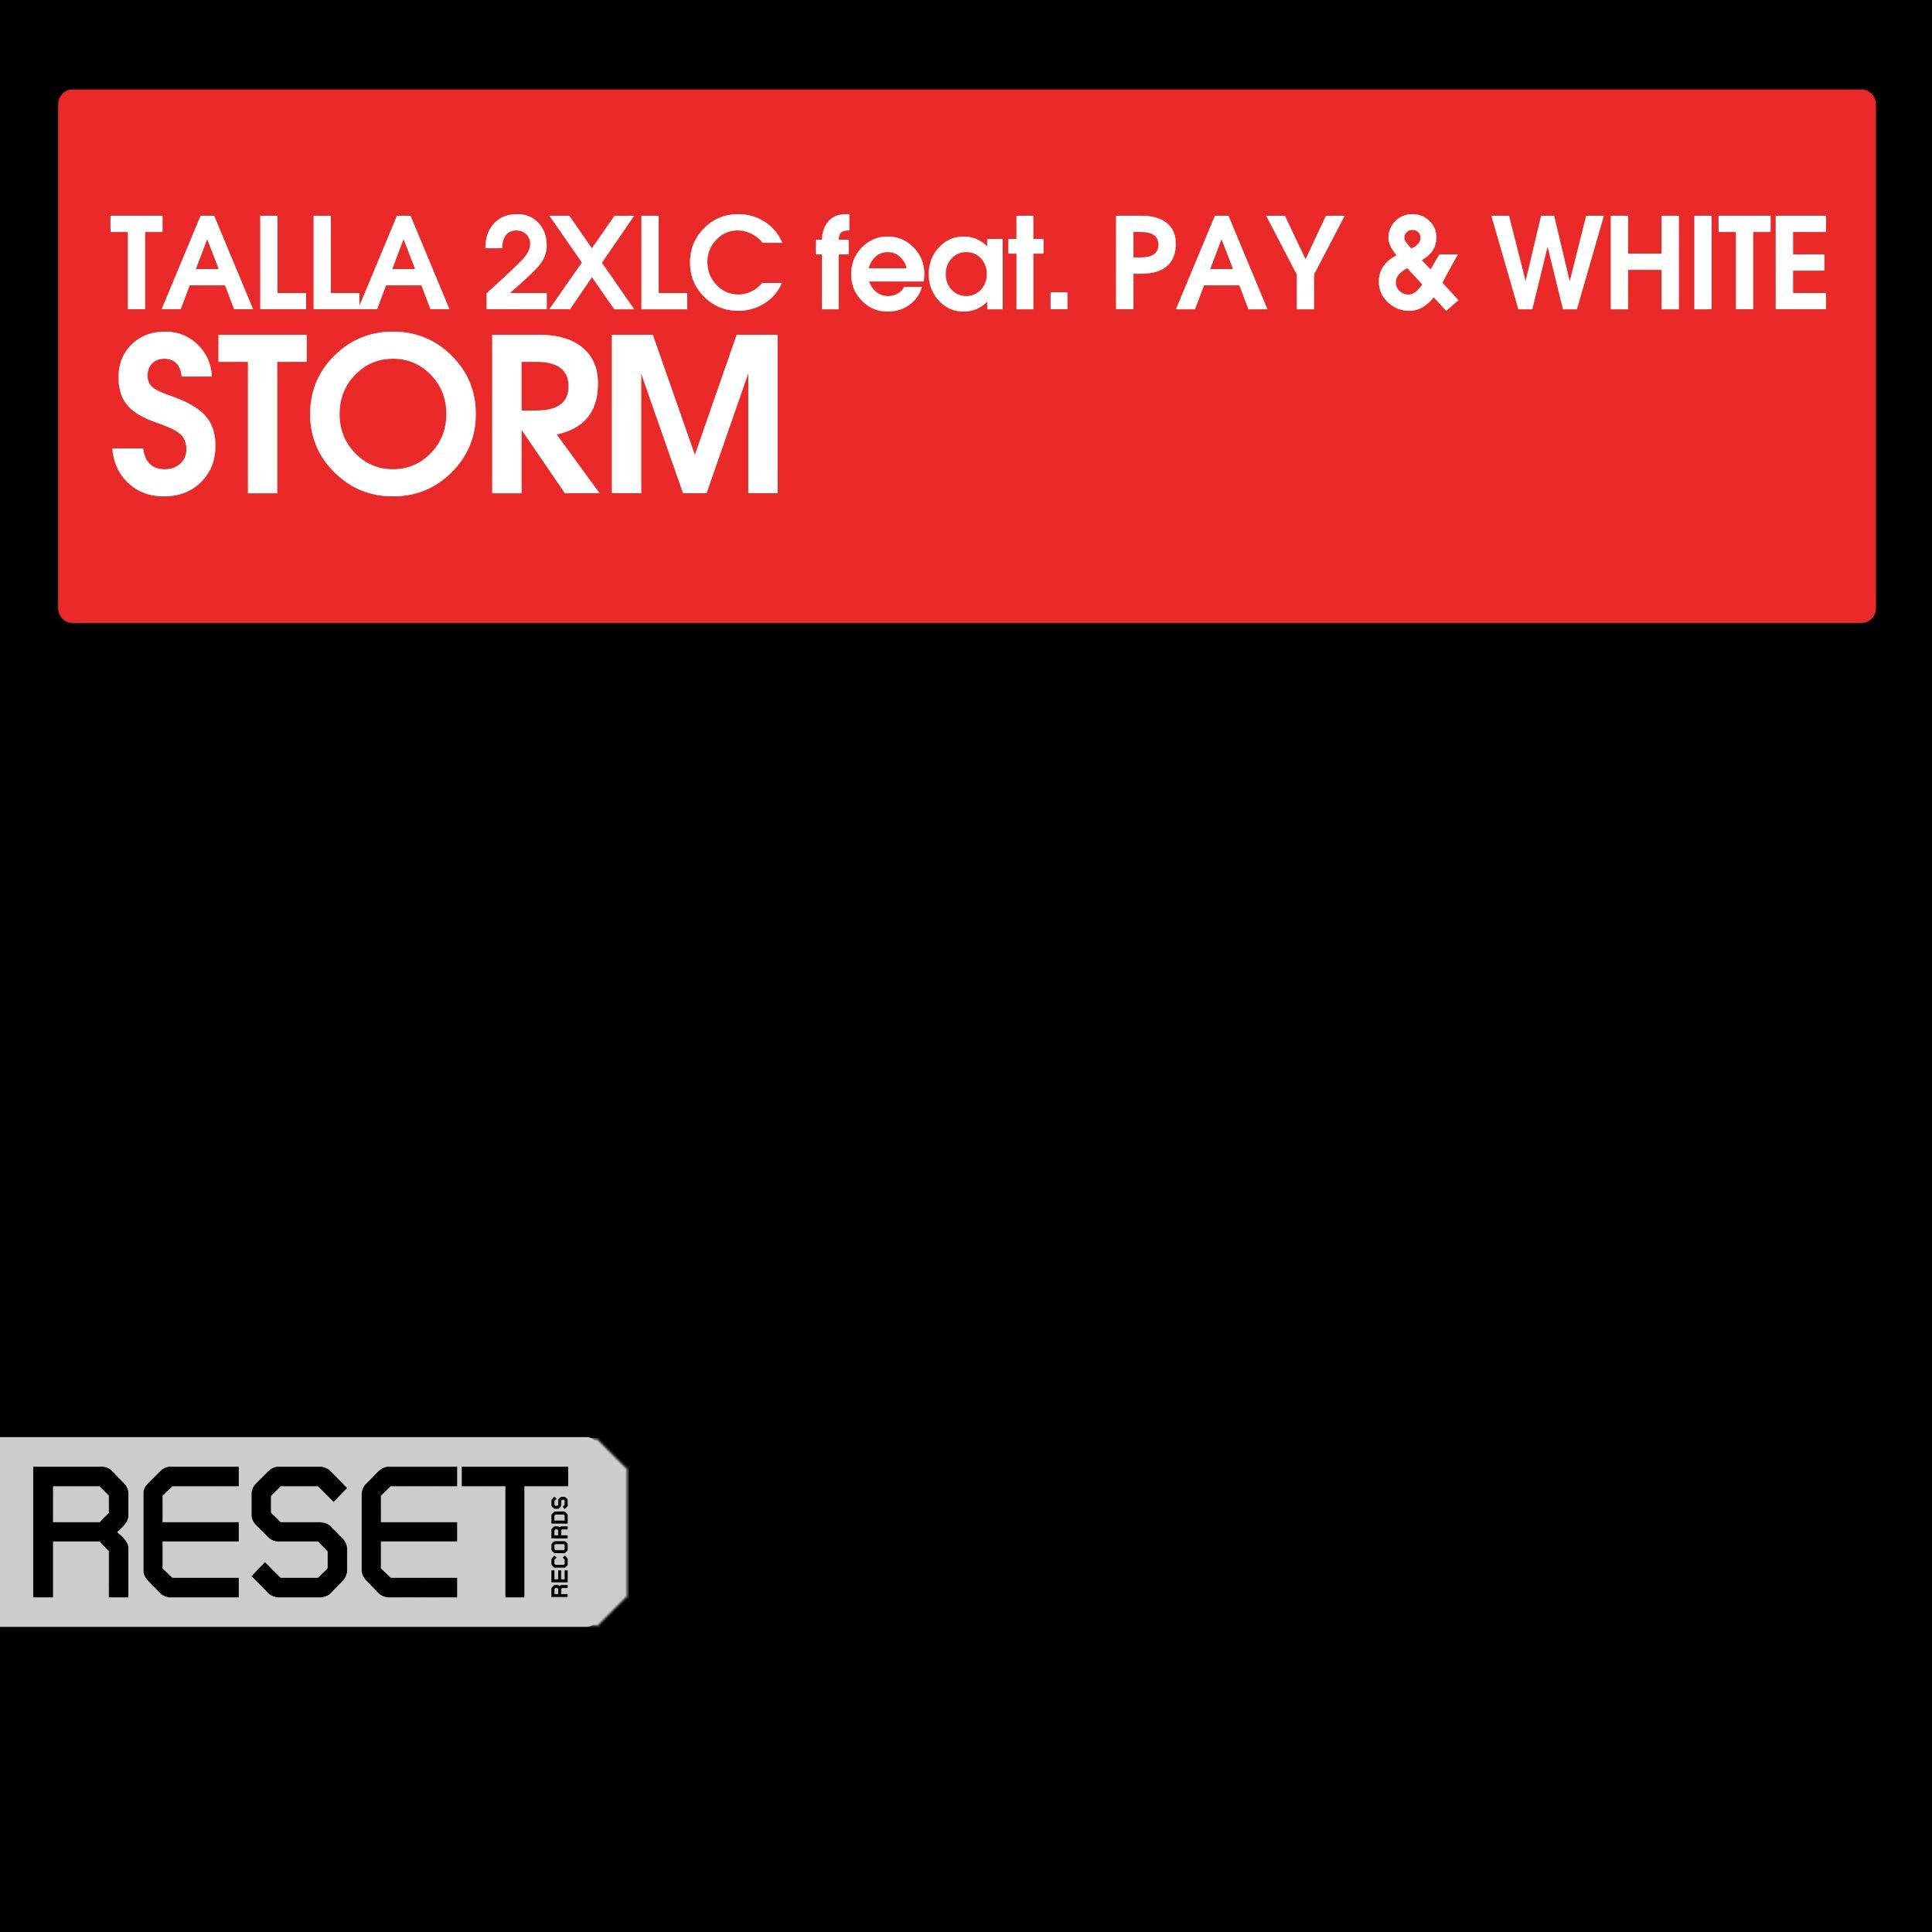 reset_talla_2xlc_feat._pay_white_-_storm.jpg